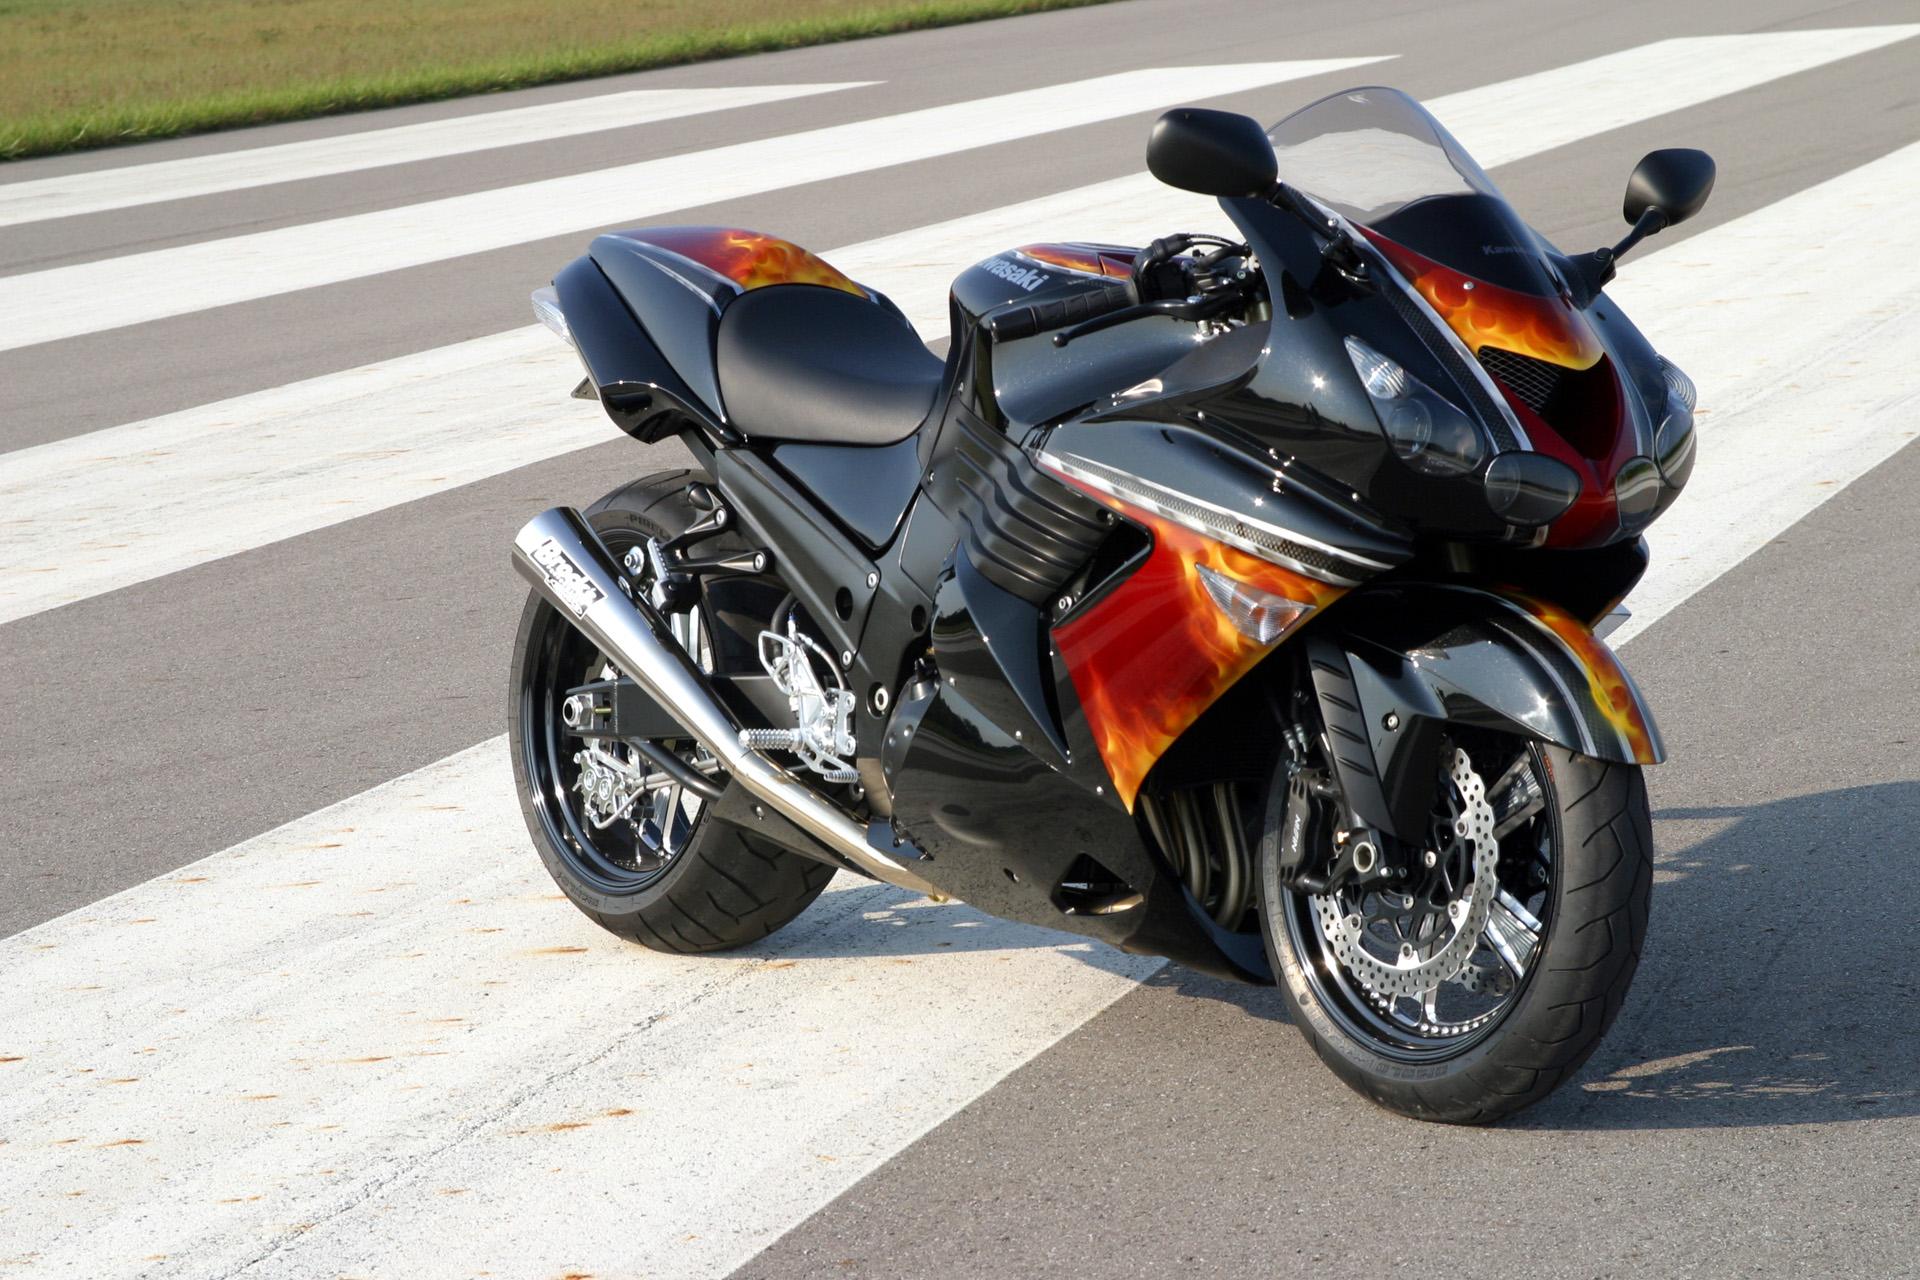 Kawasaki ZX-14 Ninja picture # 62426 | Kawasaki photo gallery ...